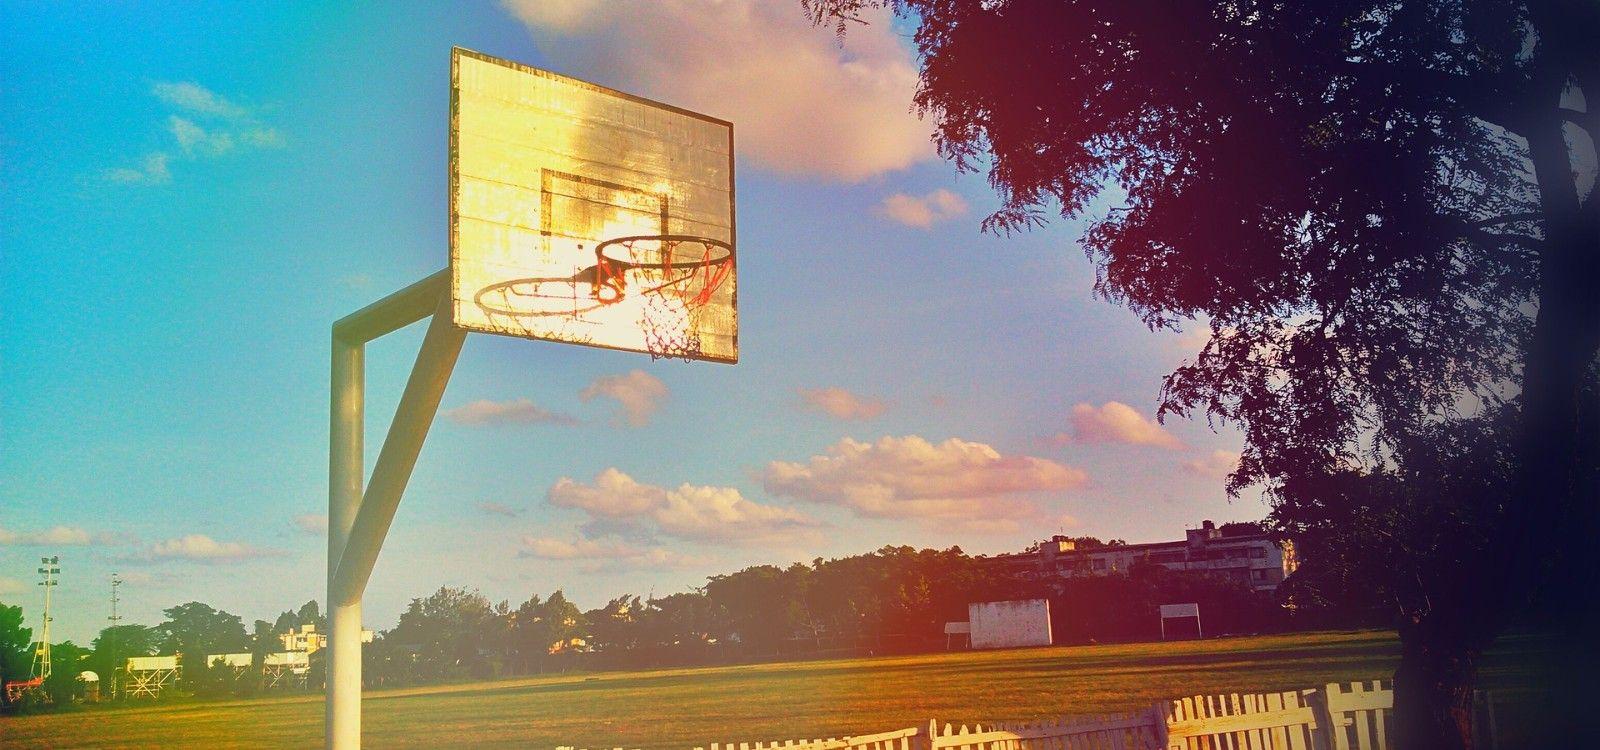 Basketball Hoop with Sun